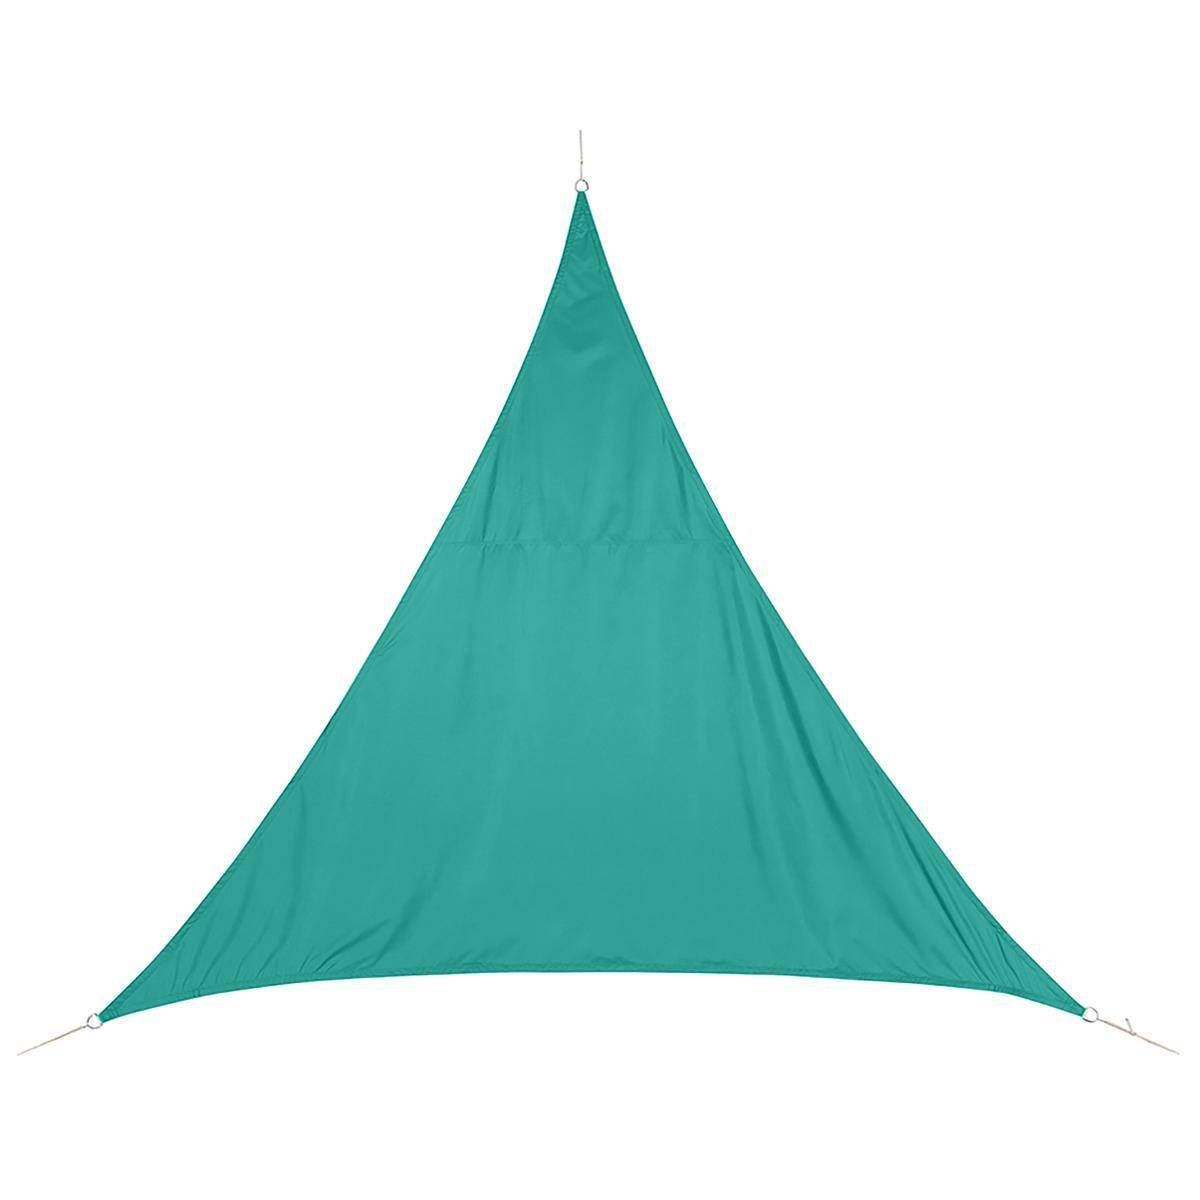 Hespéride Voile d'ombrage triangulaire Curacao Émeraude Jardin 5 x 5 x 5 m - Polyester